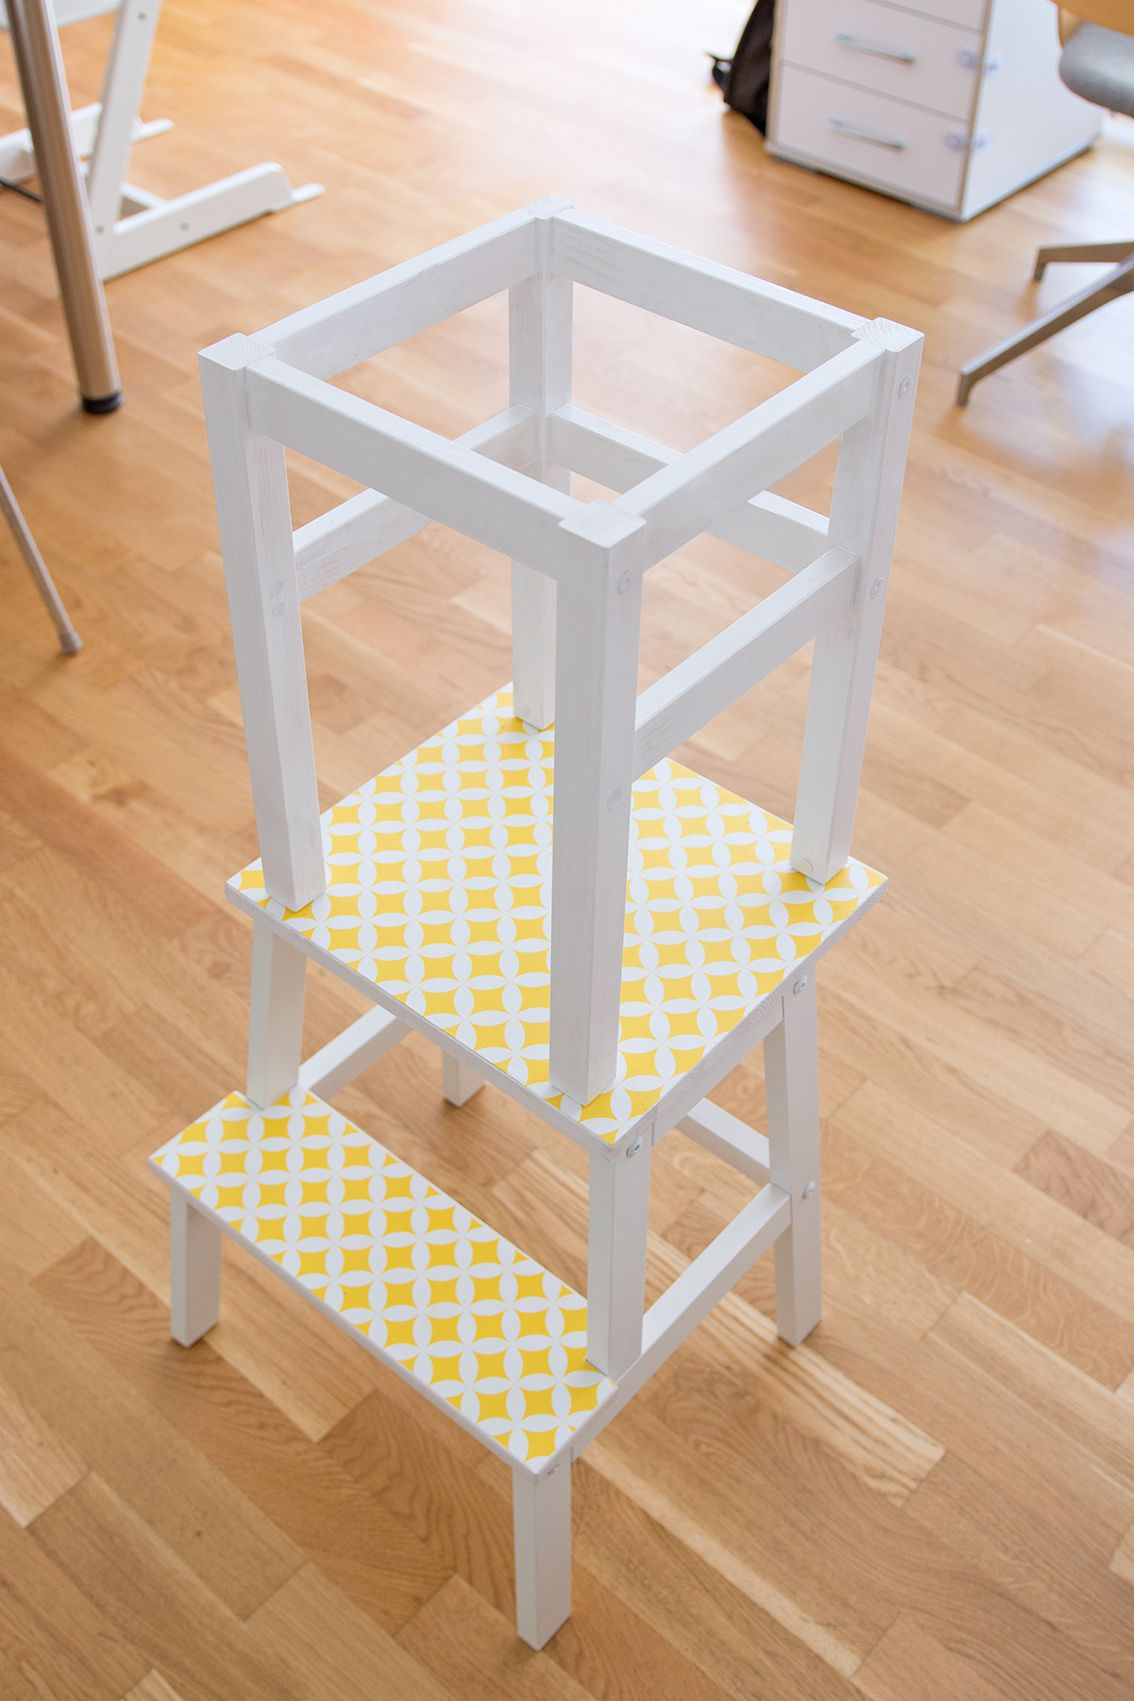 Lernturm selber bauen: Ikea Hack aus zwei Hockern | Lernturm ...